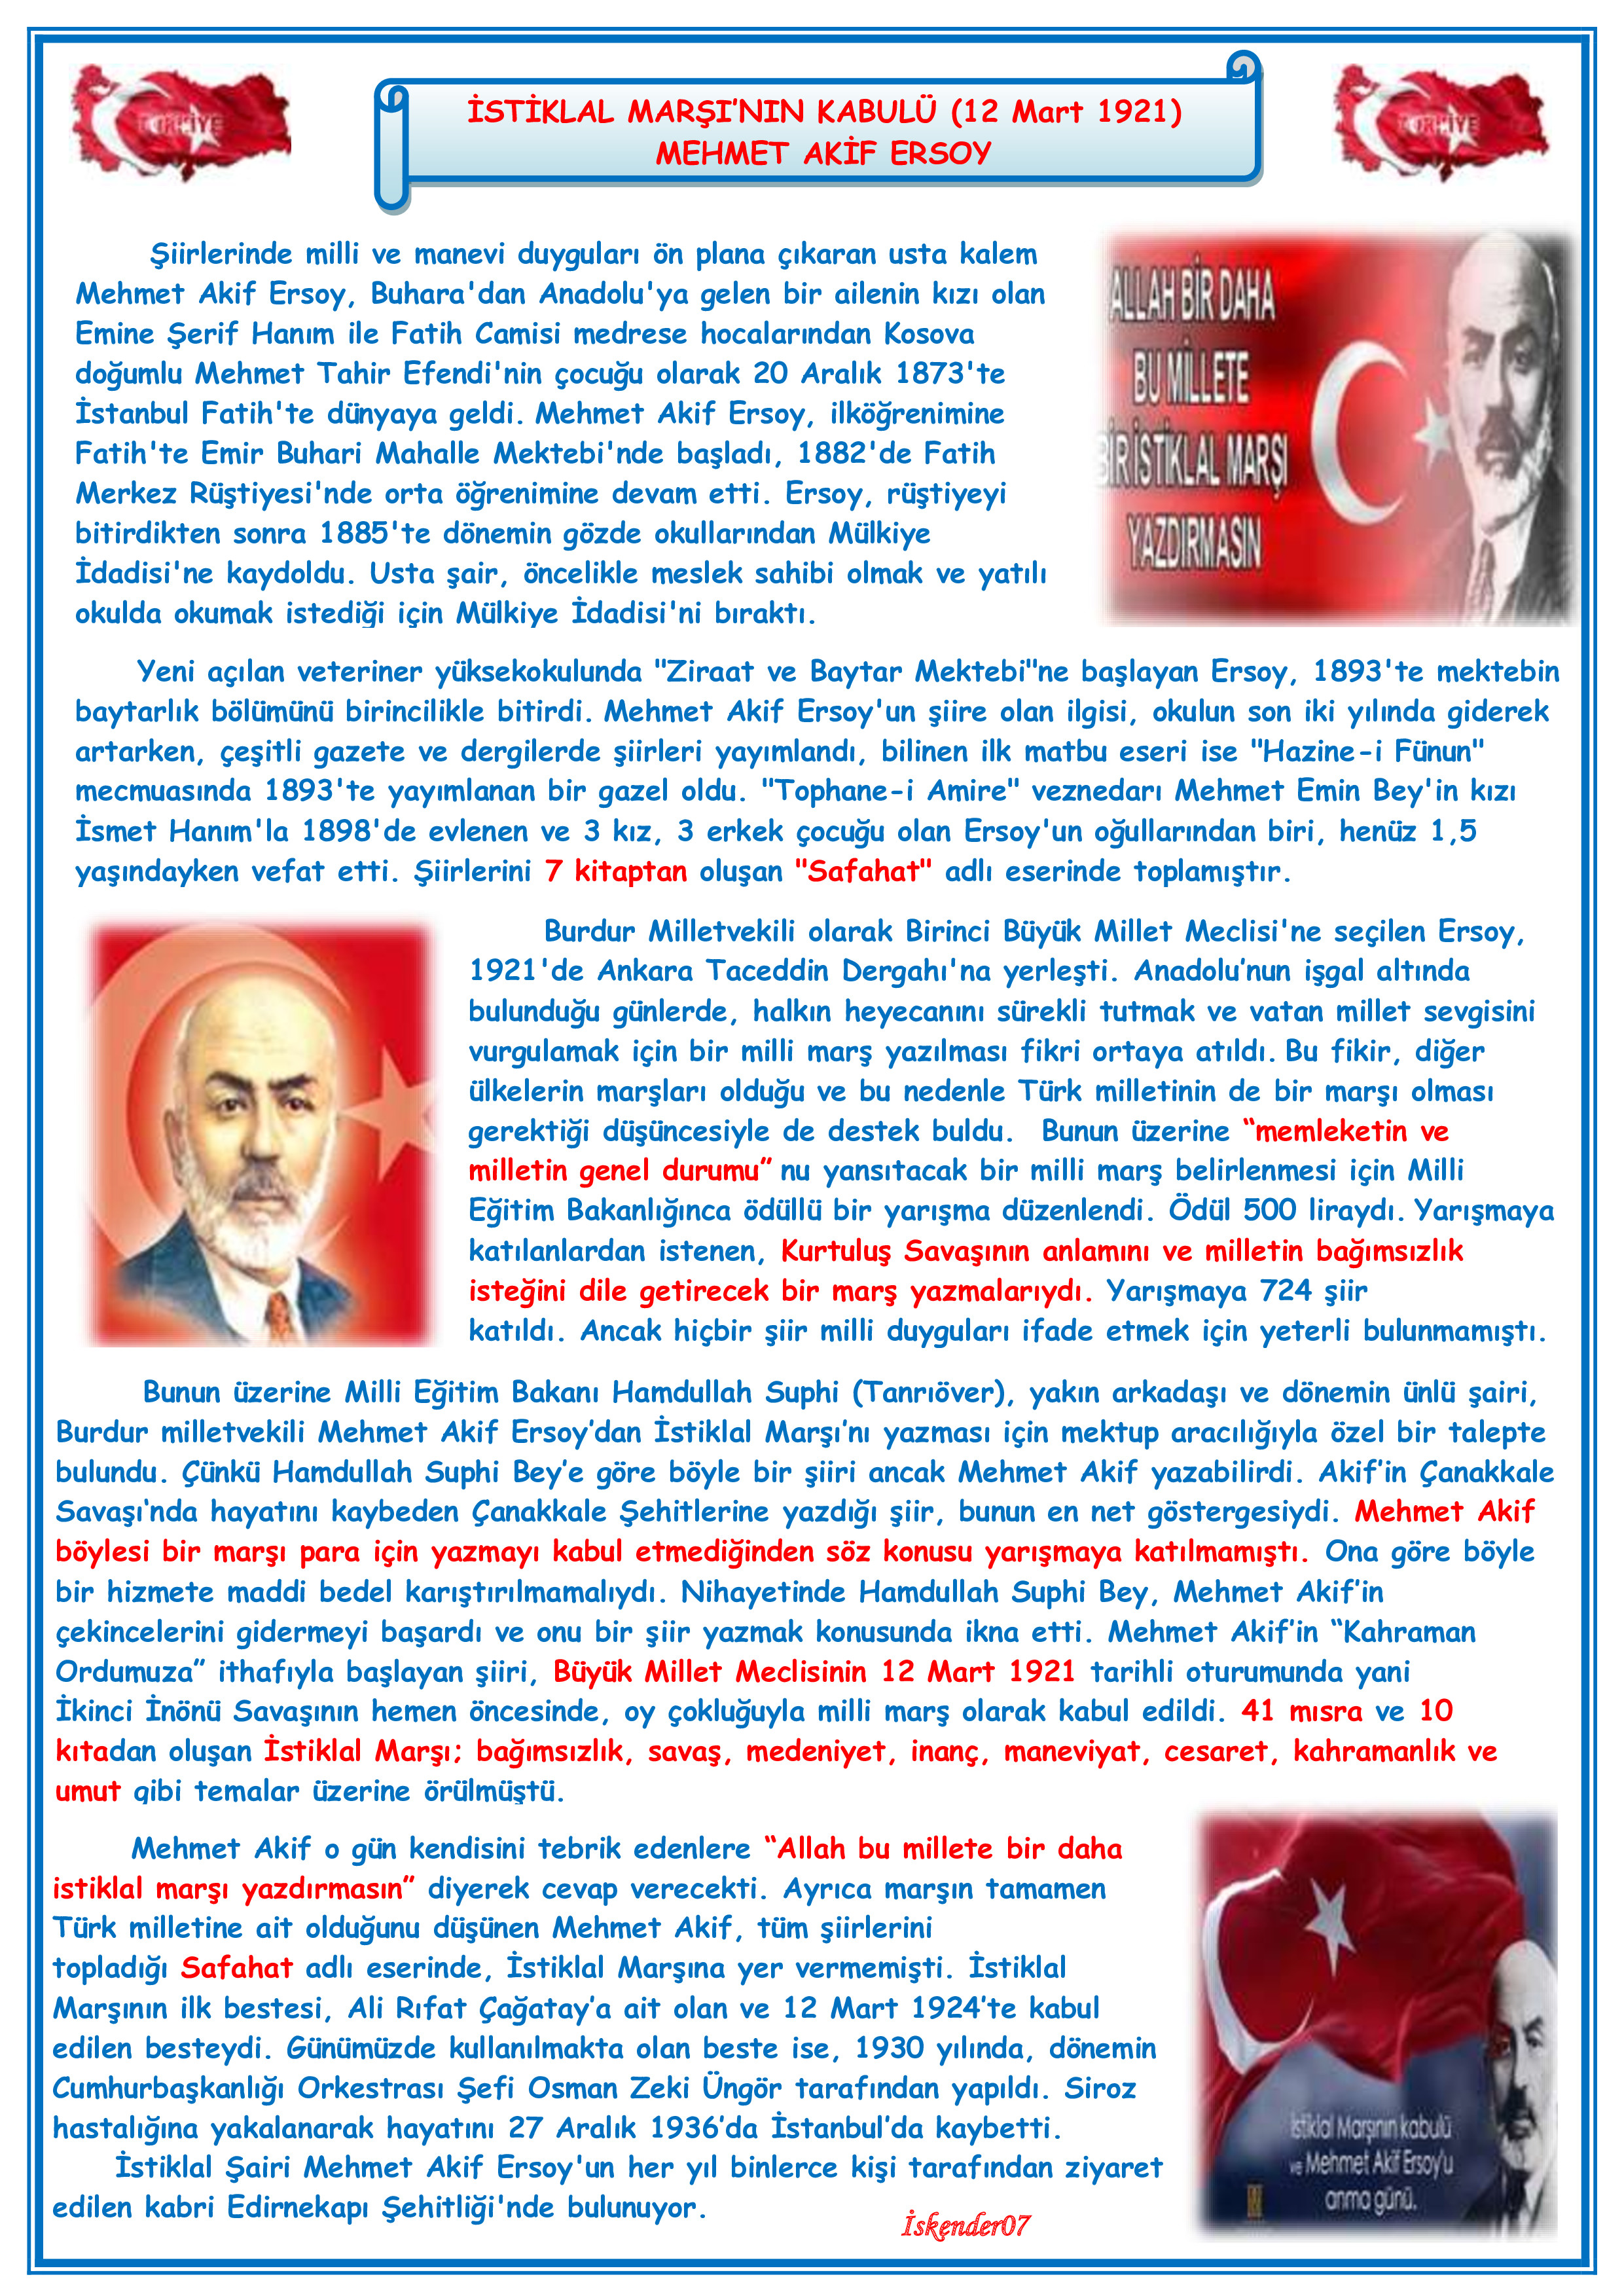 İSTİKLAL MARŞI'NIN KABULÜ - MEHMET AKİF ERSOY METİN ÇALIŞMASI